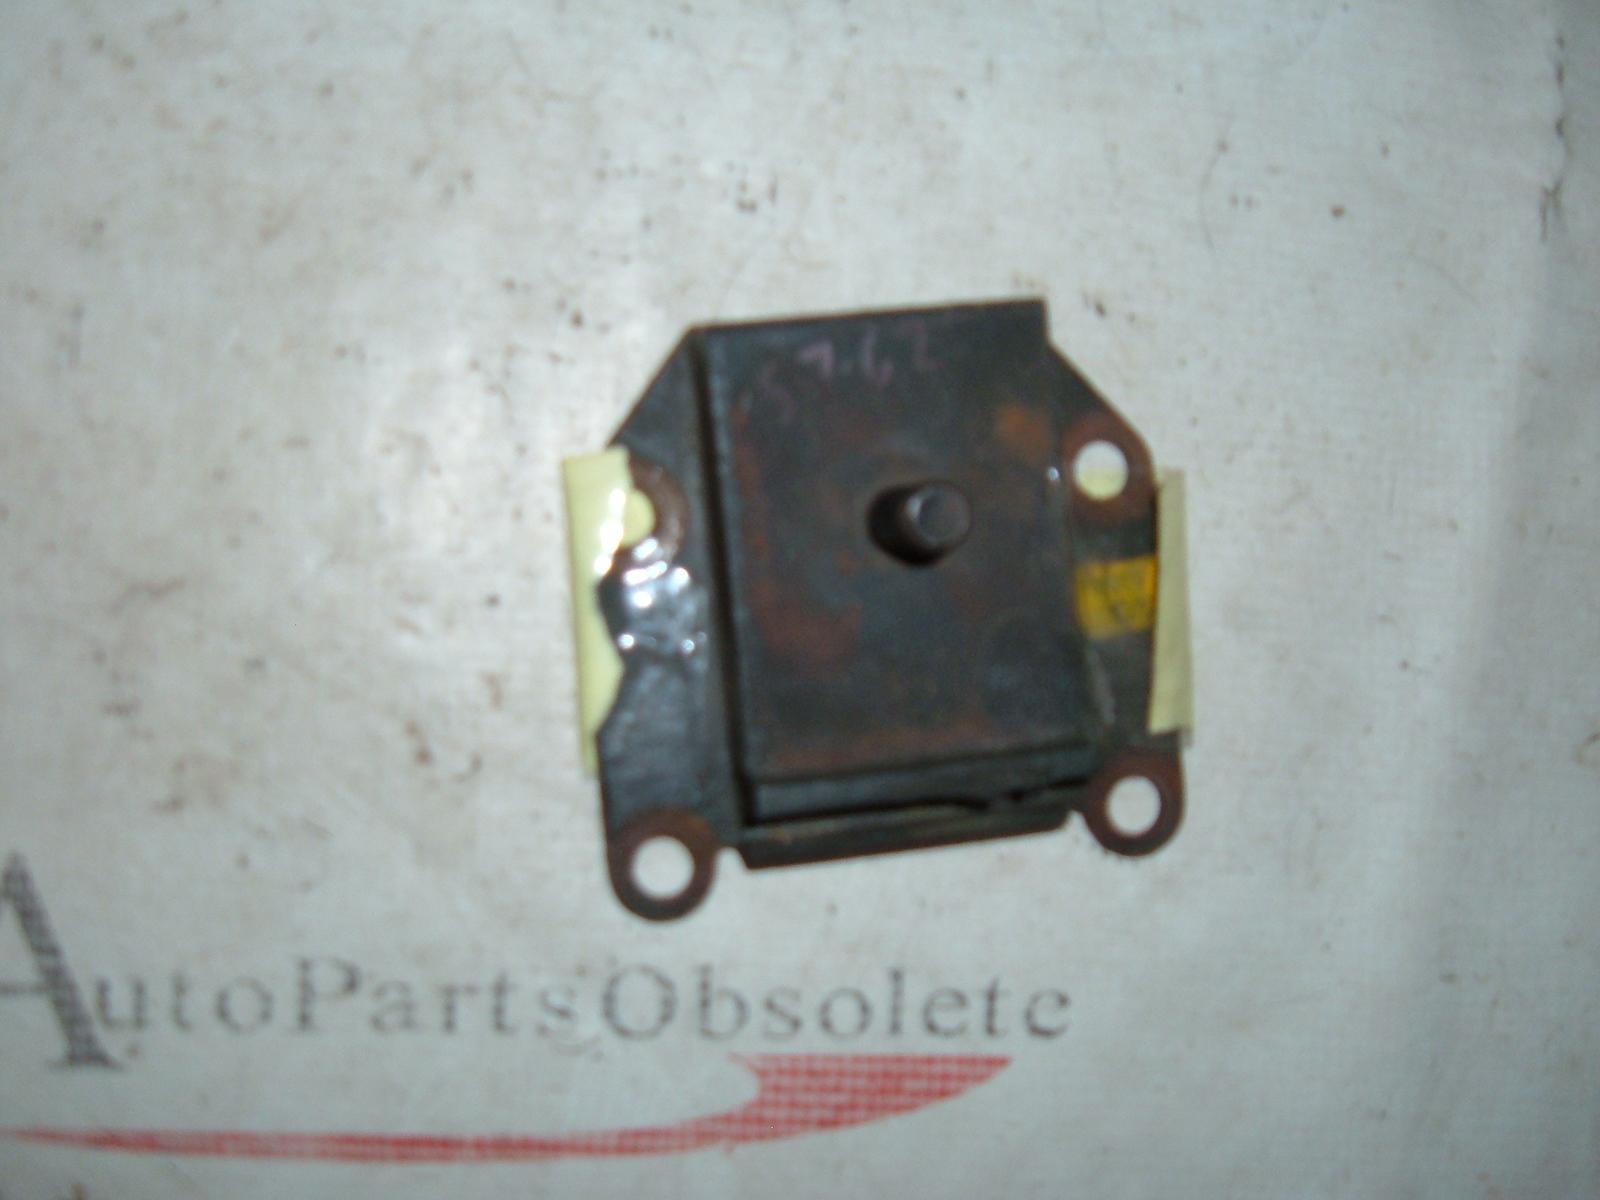 1957 58 59 60 61 62 rambler classic ambassador motor mount nos 9100901 (z 9100901)